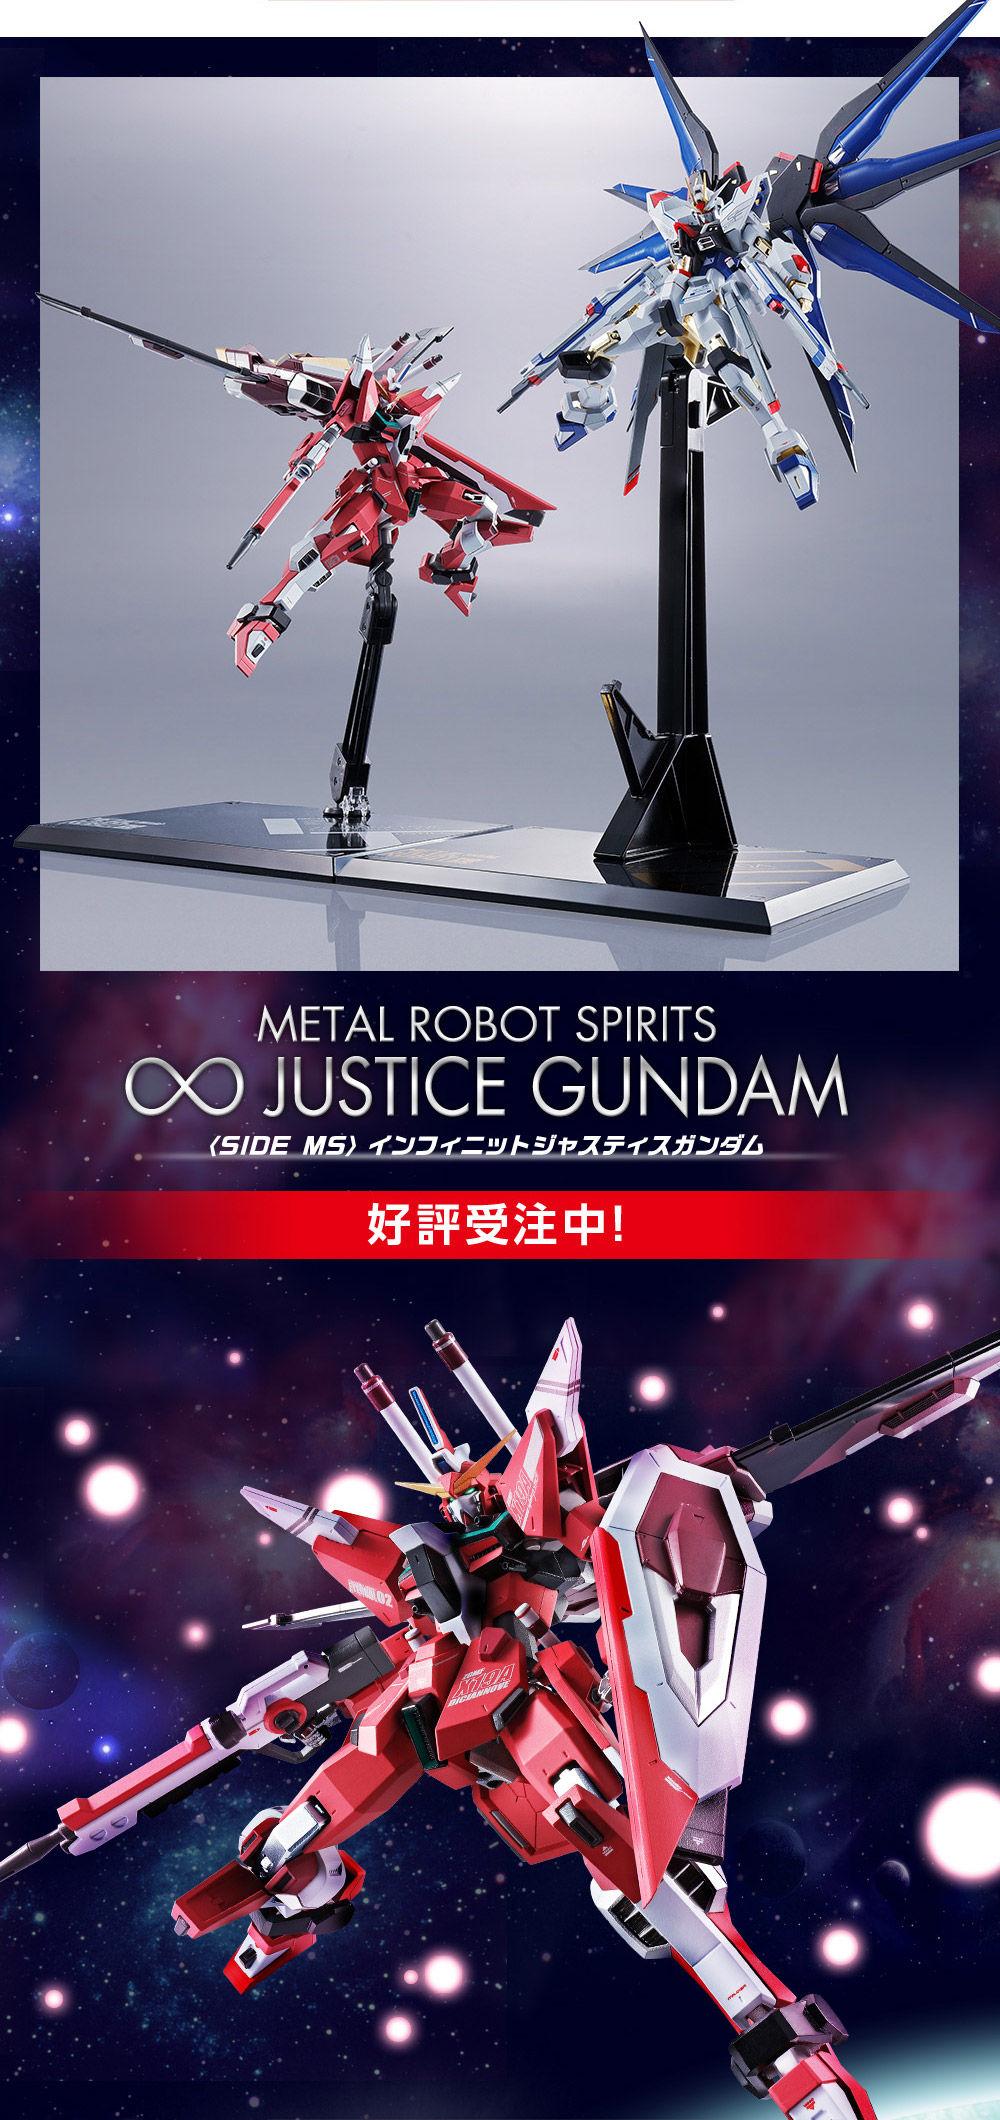 Gundam - Metal Robot Side MS (Bandai) - Page 2 J97qipDI_o